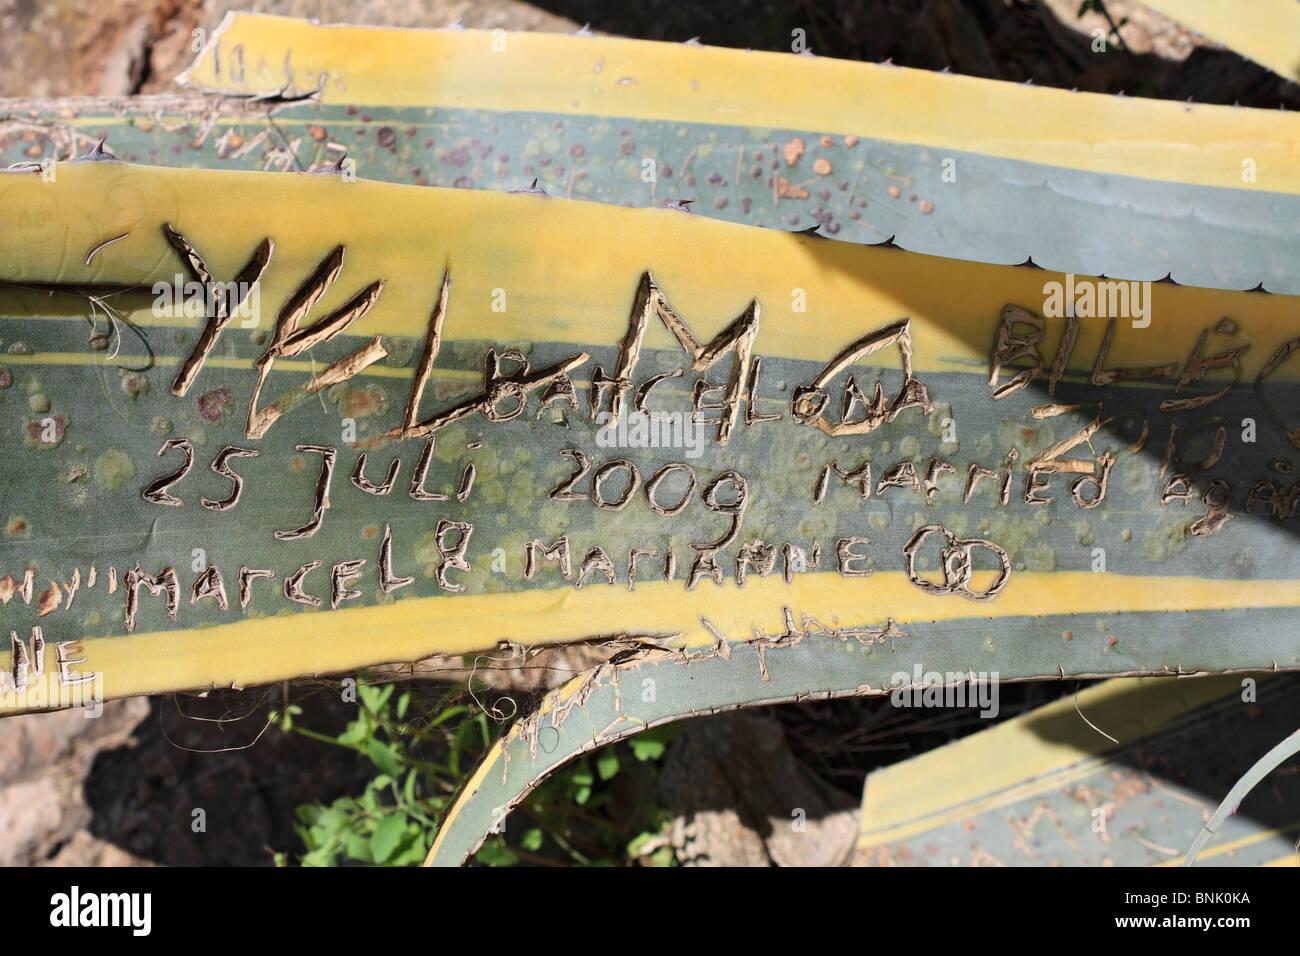 Graffiti on cactus plant leaf in park güell barcelona spain stock image